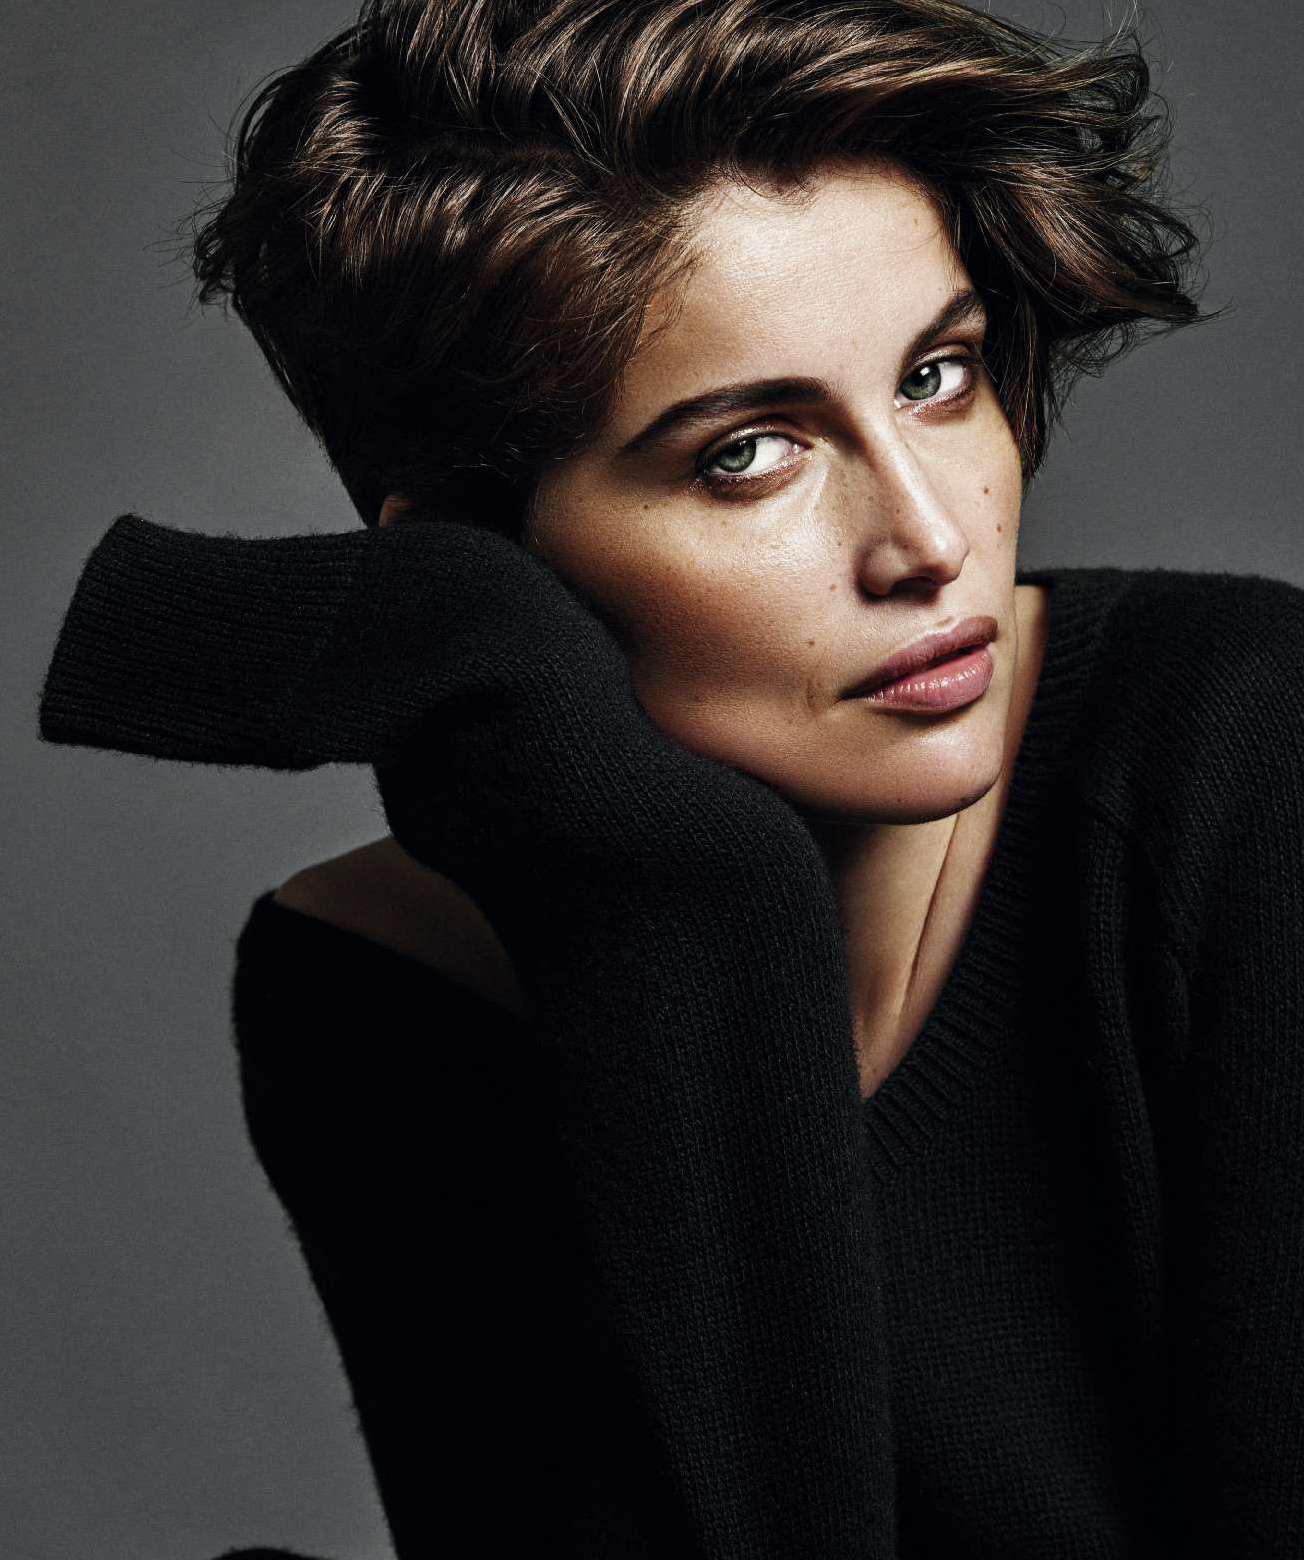 Hepburns audrey granddaughter emma ferrer, Mehndi stylish designs hands